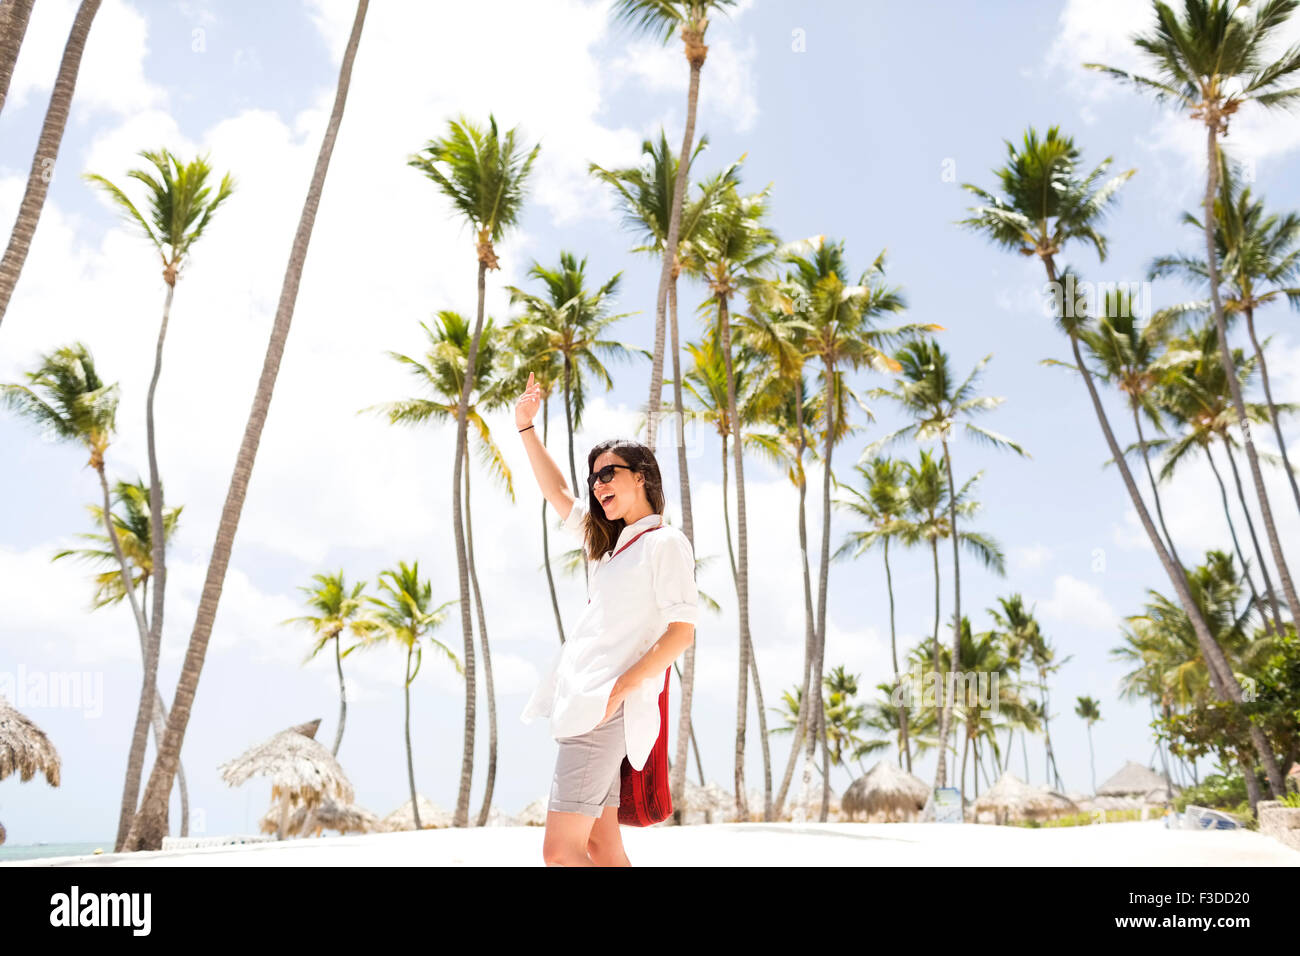 Frau stehend unter Palmen Stockbild